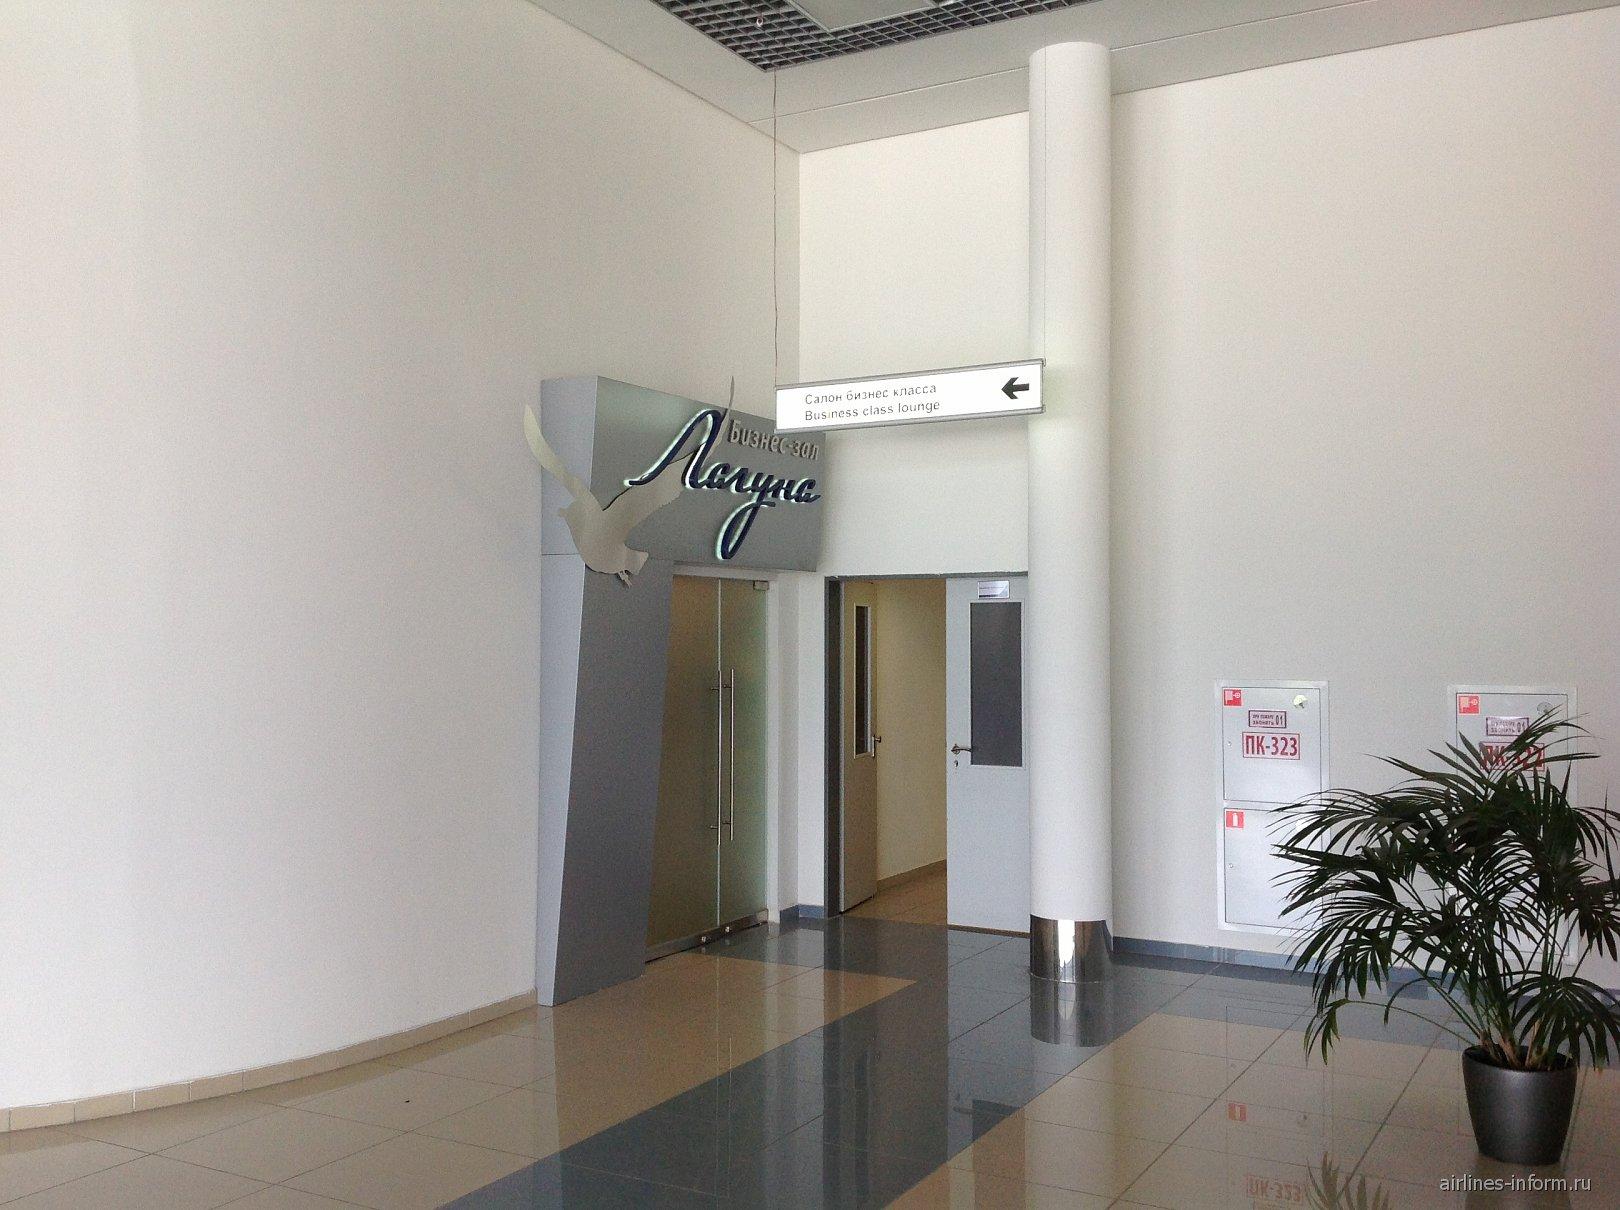 Бизнес-зал аэропорта Владивосток Кневичи